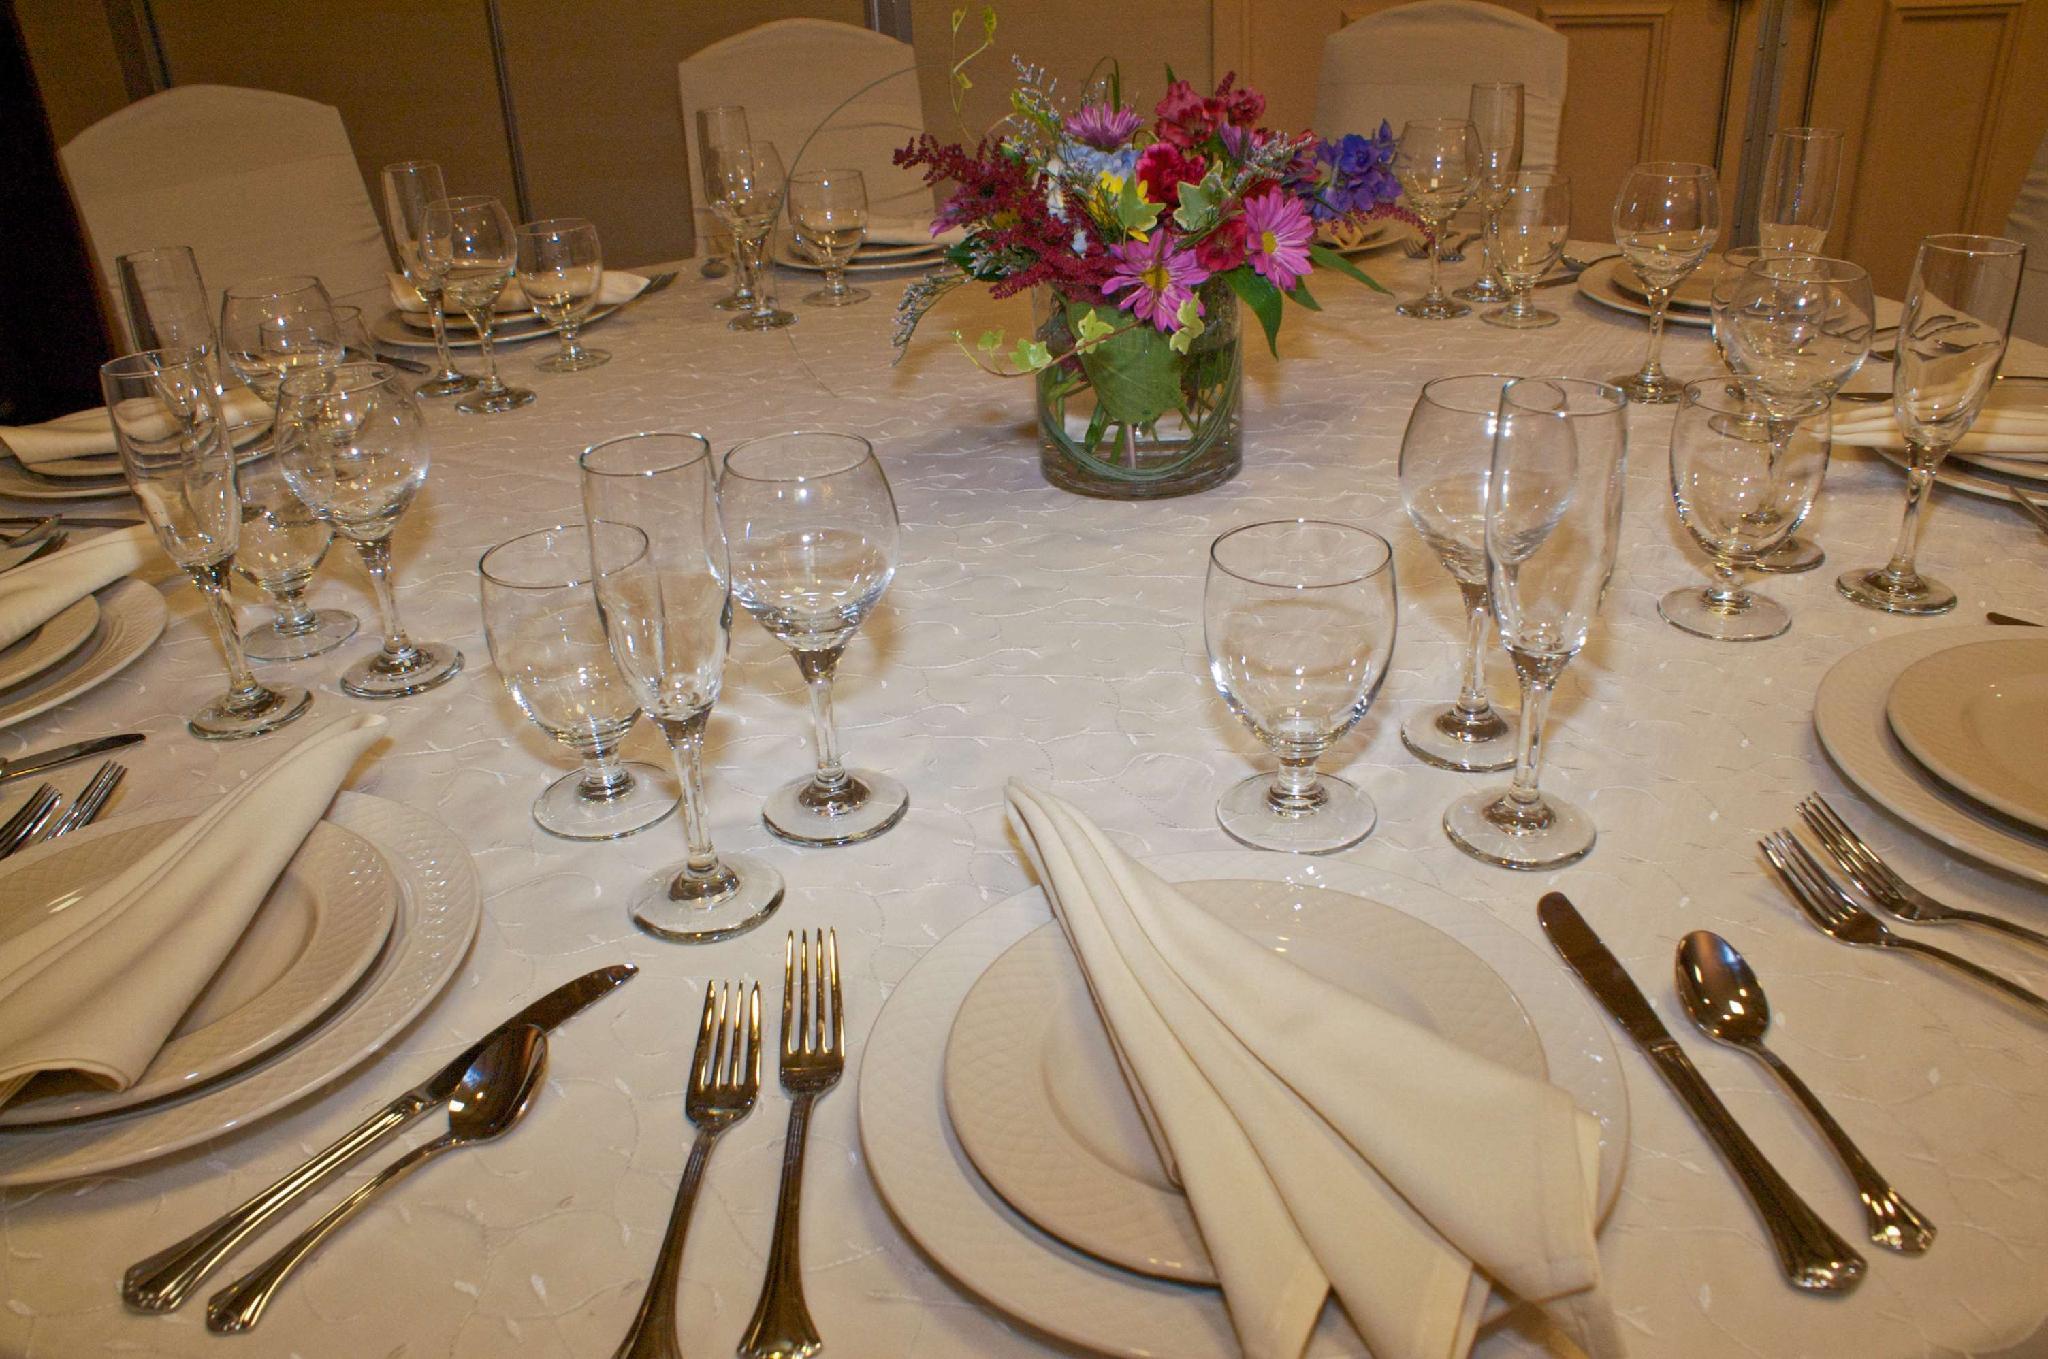 Best Price on Hilton Garden Inn Milford in Milford CT Reviews